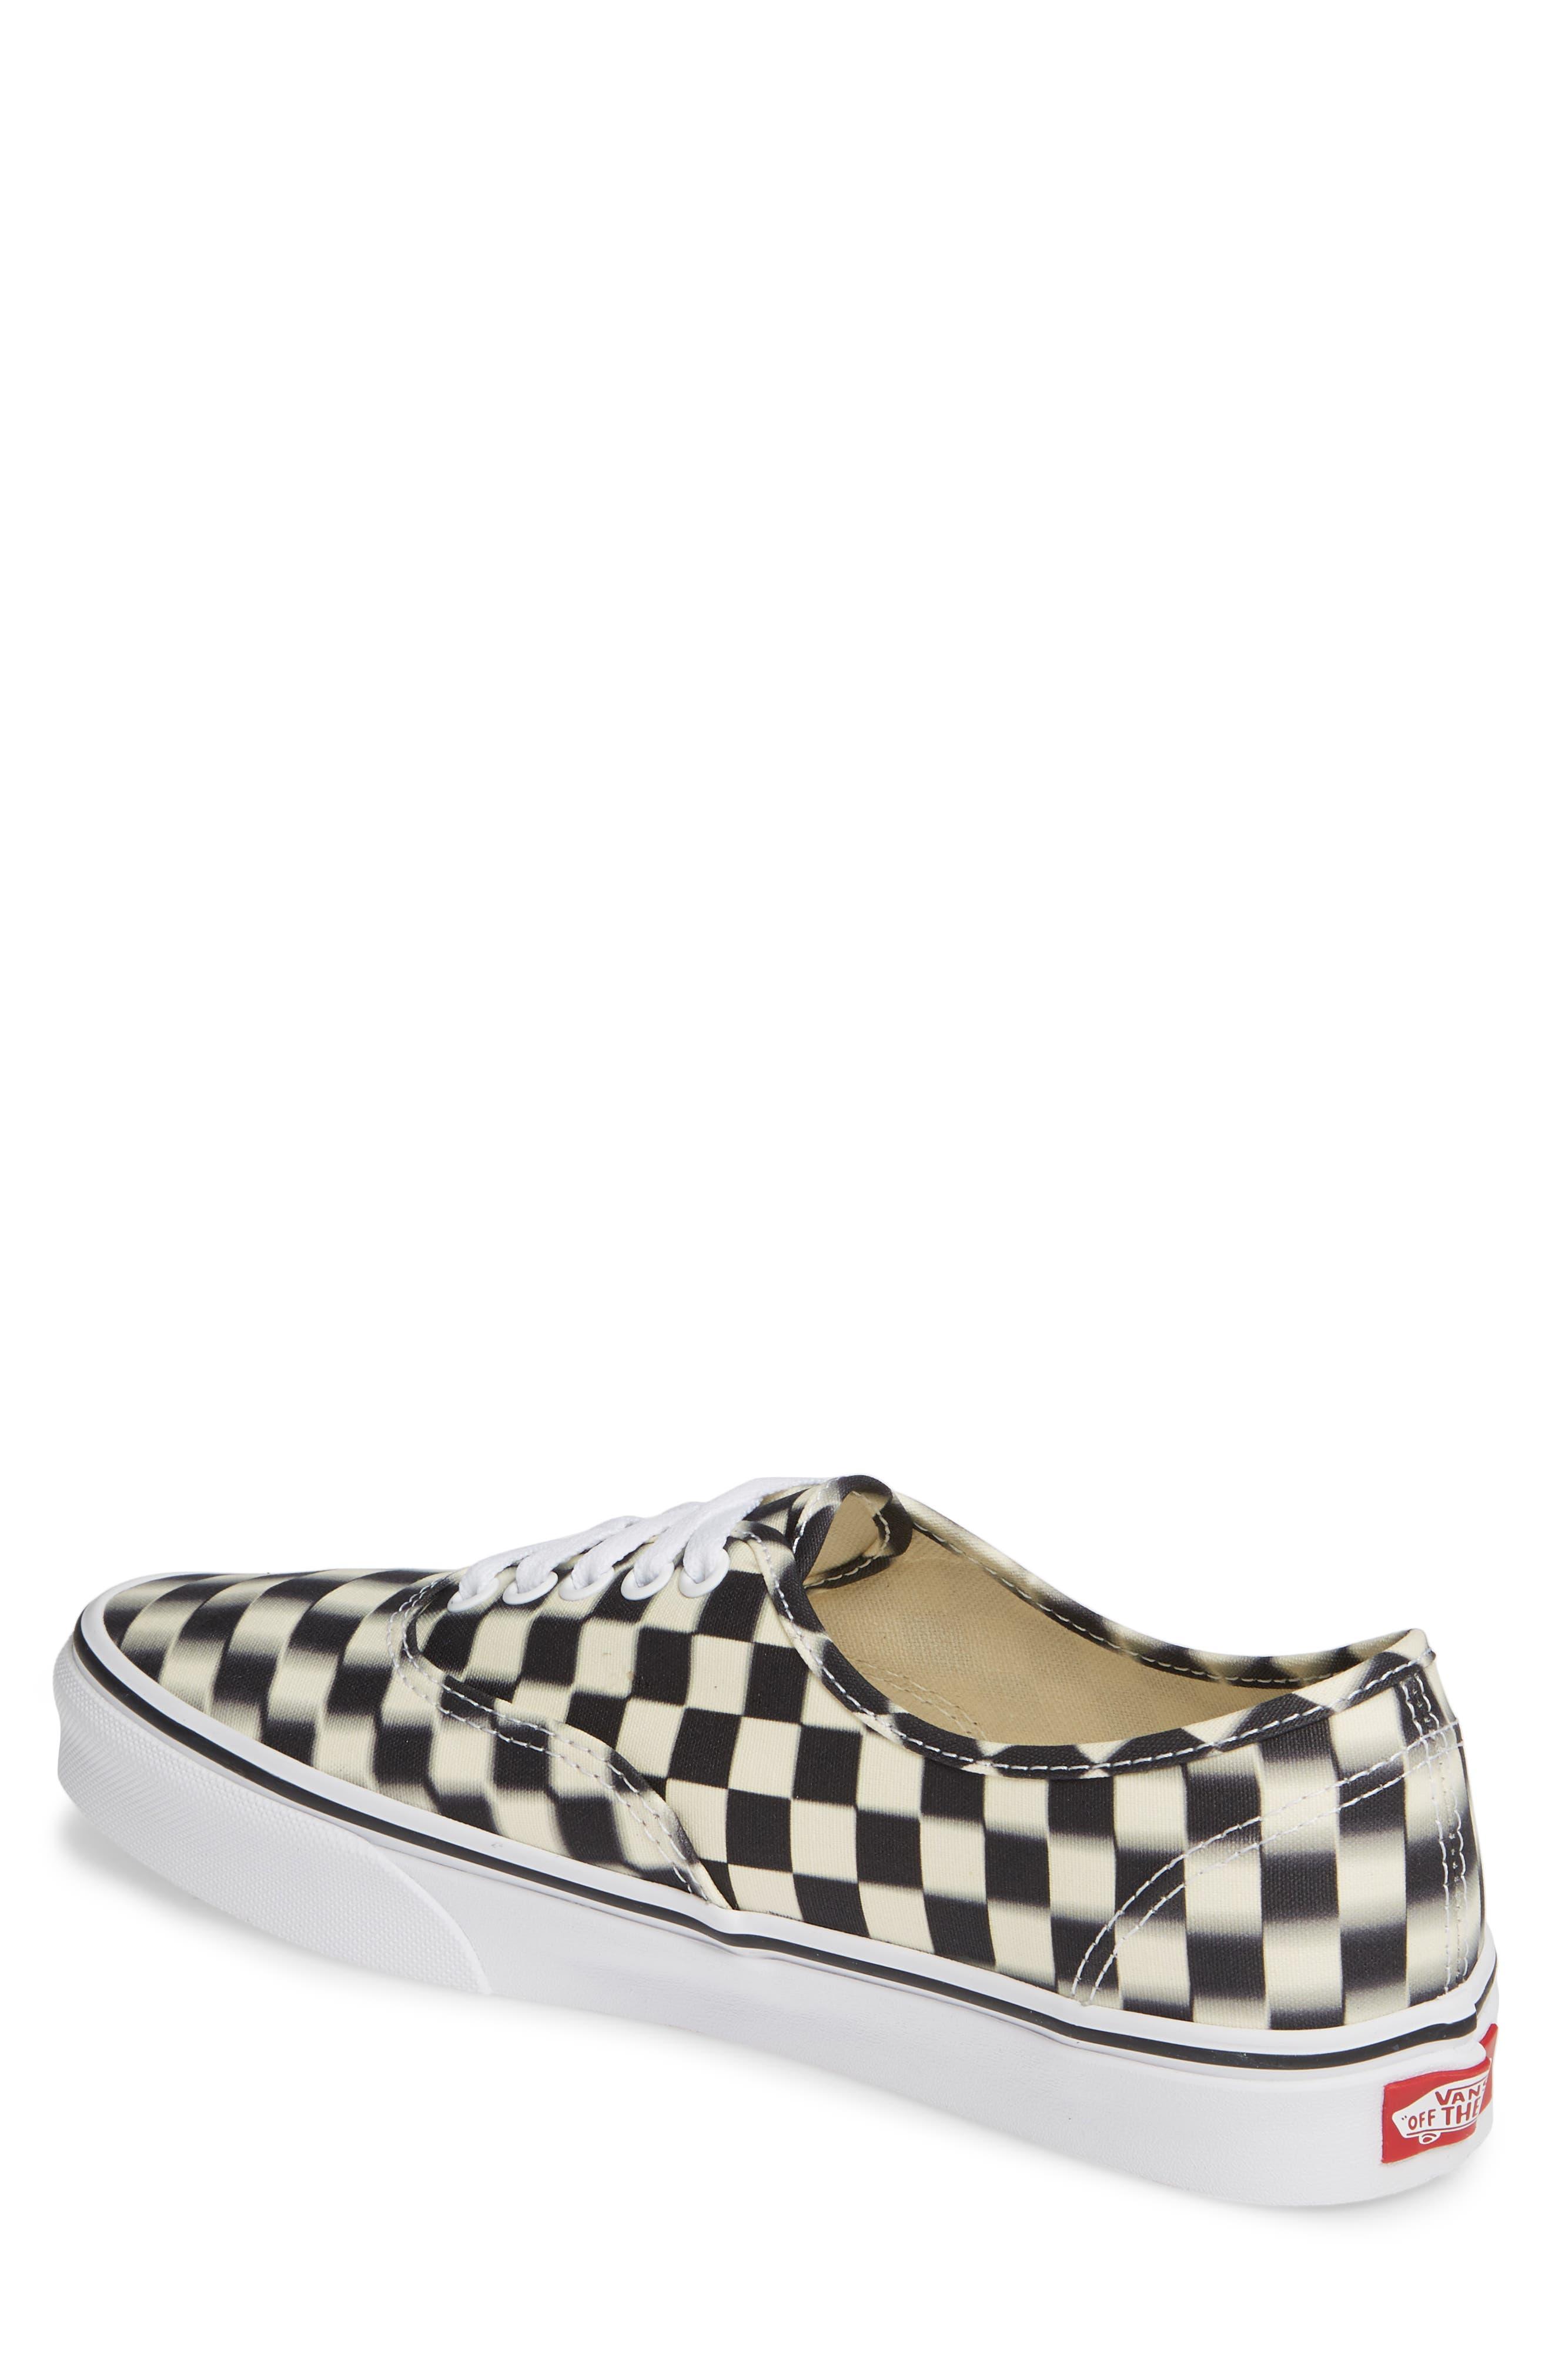 VANS,                             UA Authentic Sneaker,                             Alternate thumbnail 2, color,                             BLACK/ CLASSIC WHITE CHECK